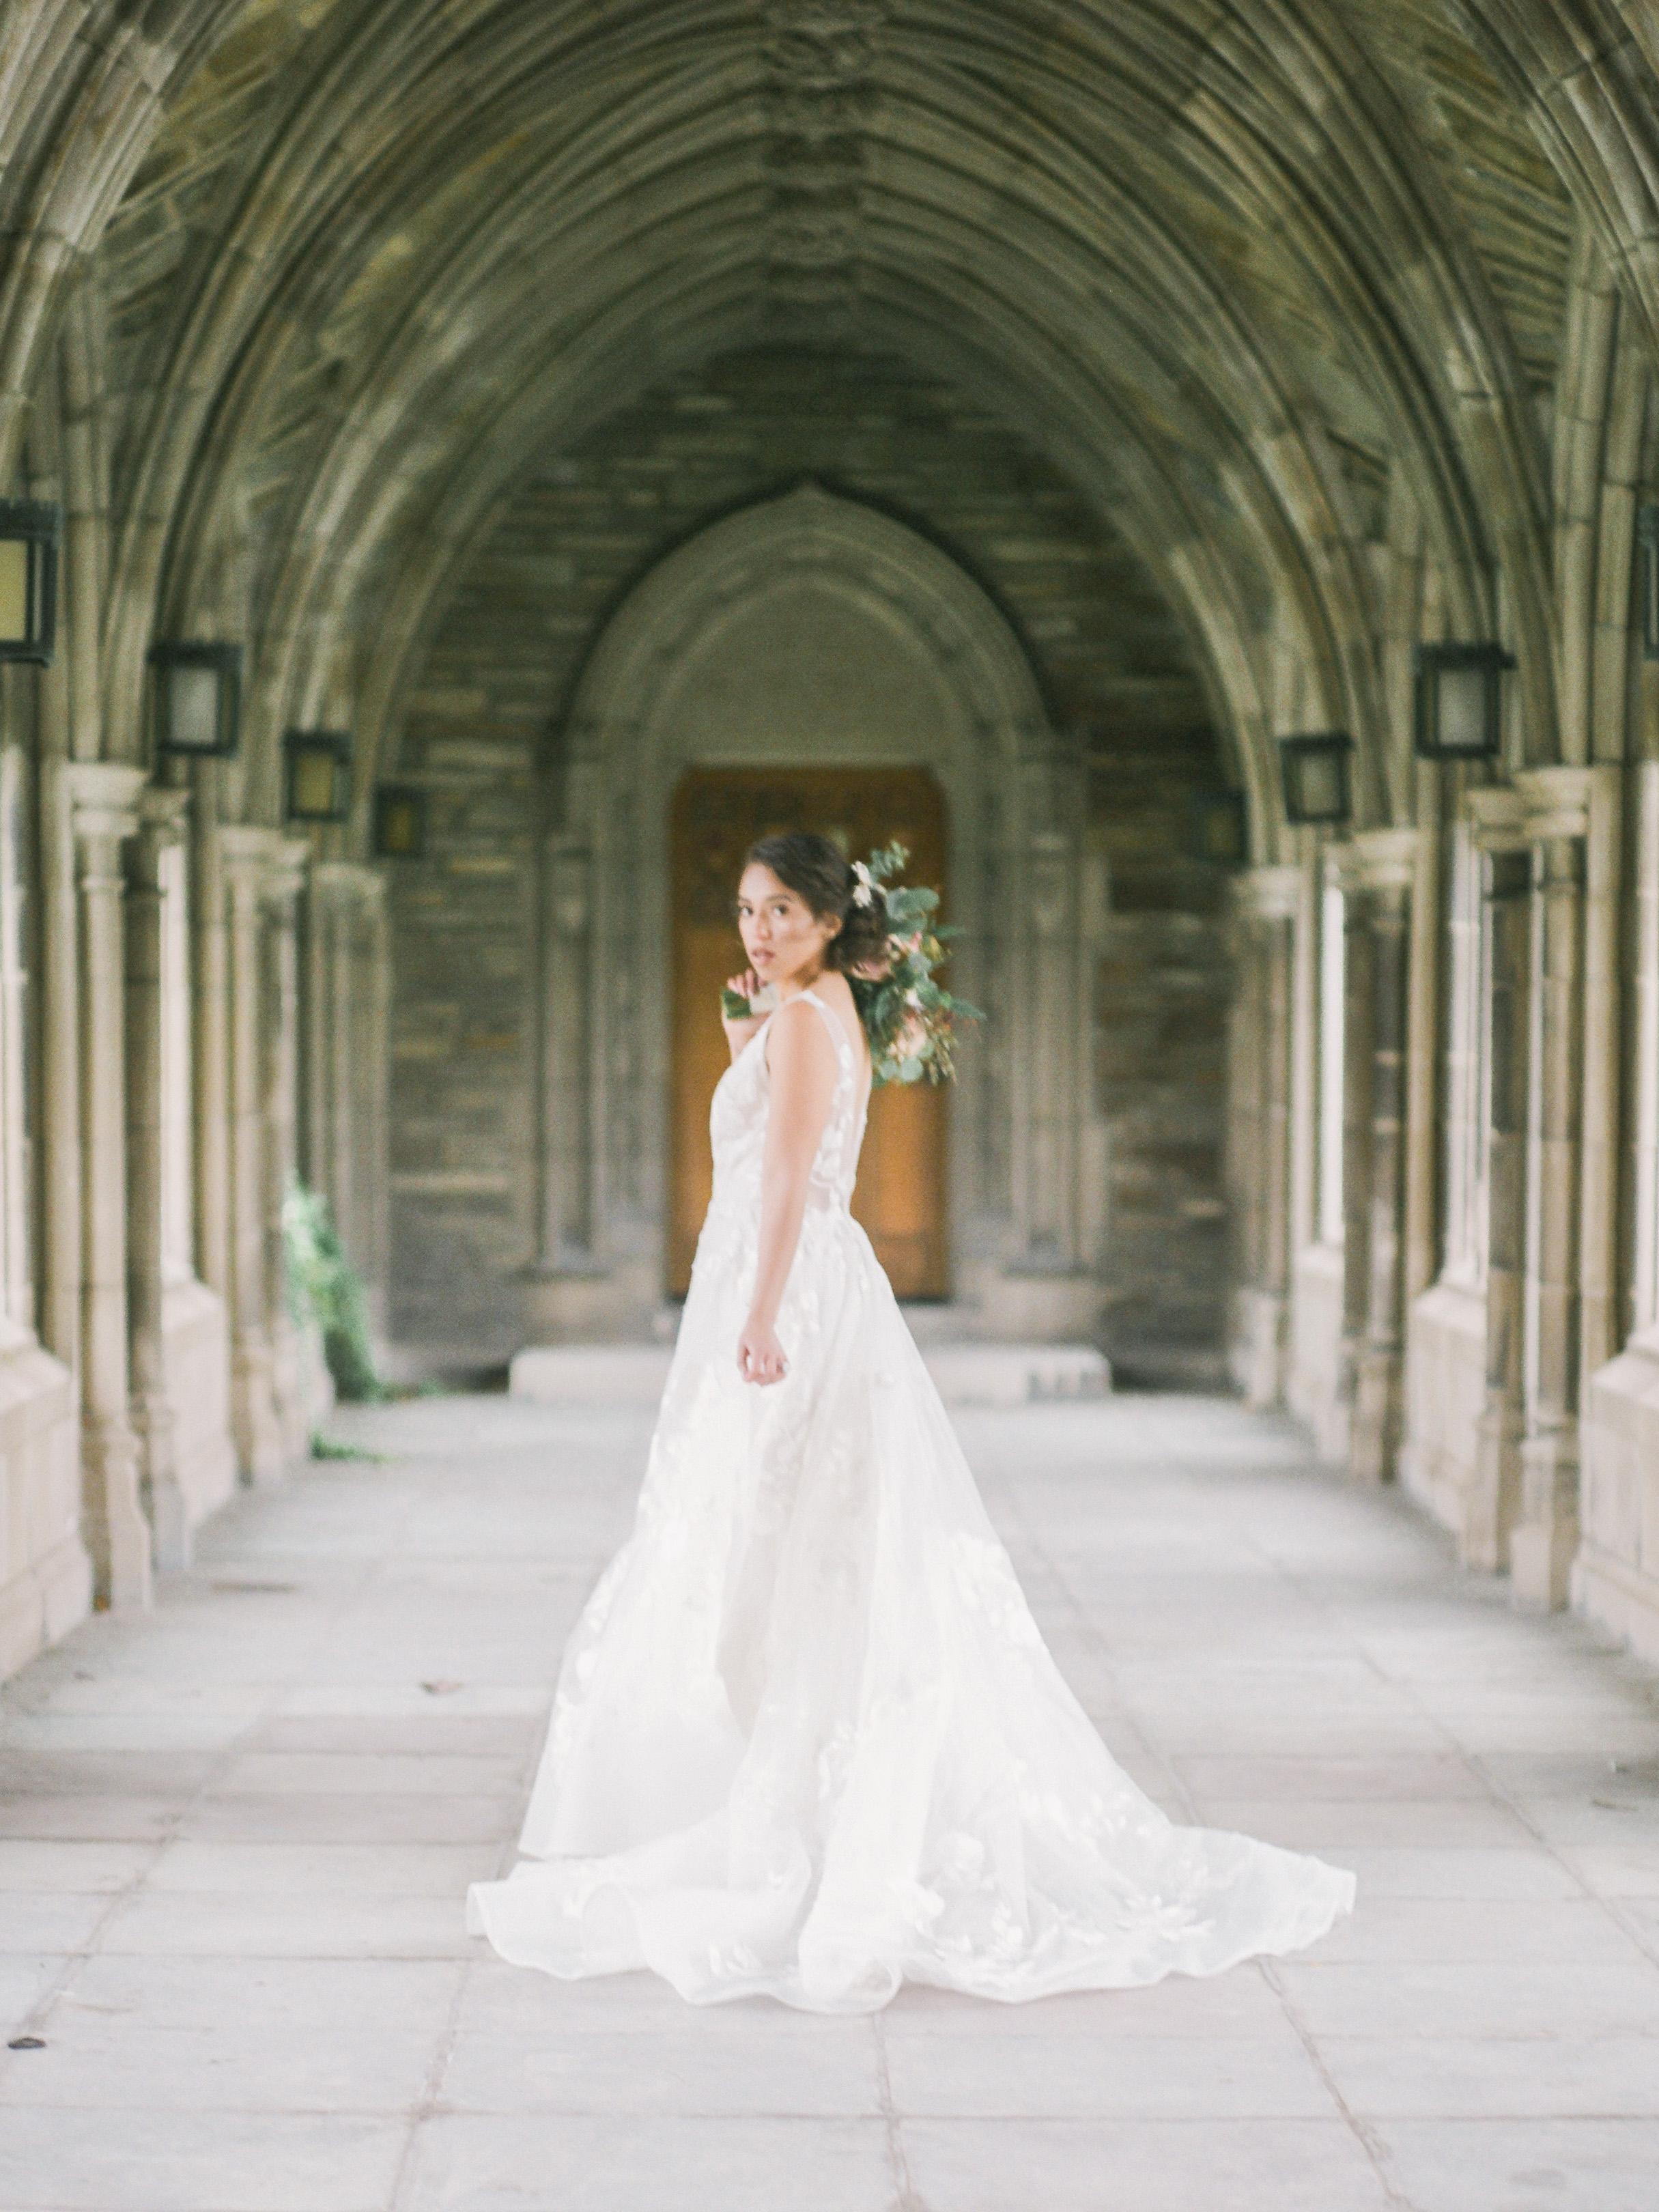 Ithaca New York-Brides Story-Manda Weaver-Wedding-7.jpg